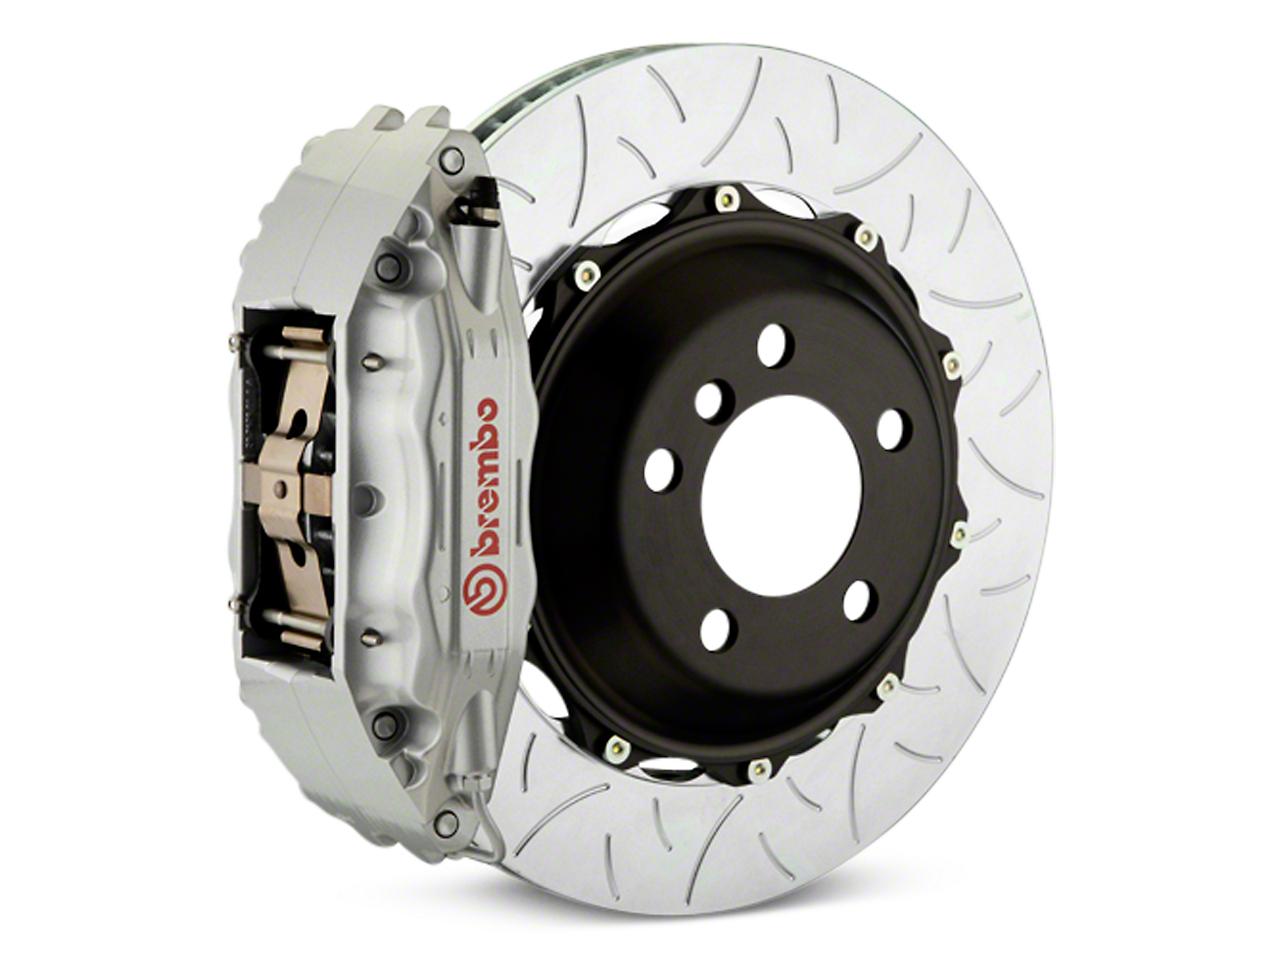 Brembo GT Series 4-Piston Rear Brake Kit - Type 3 Slotted Rotors - Silver (07-13 Silverado 1500)